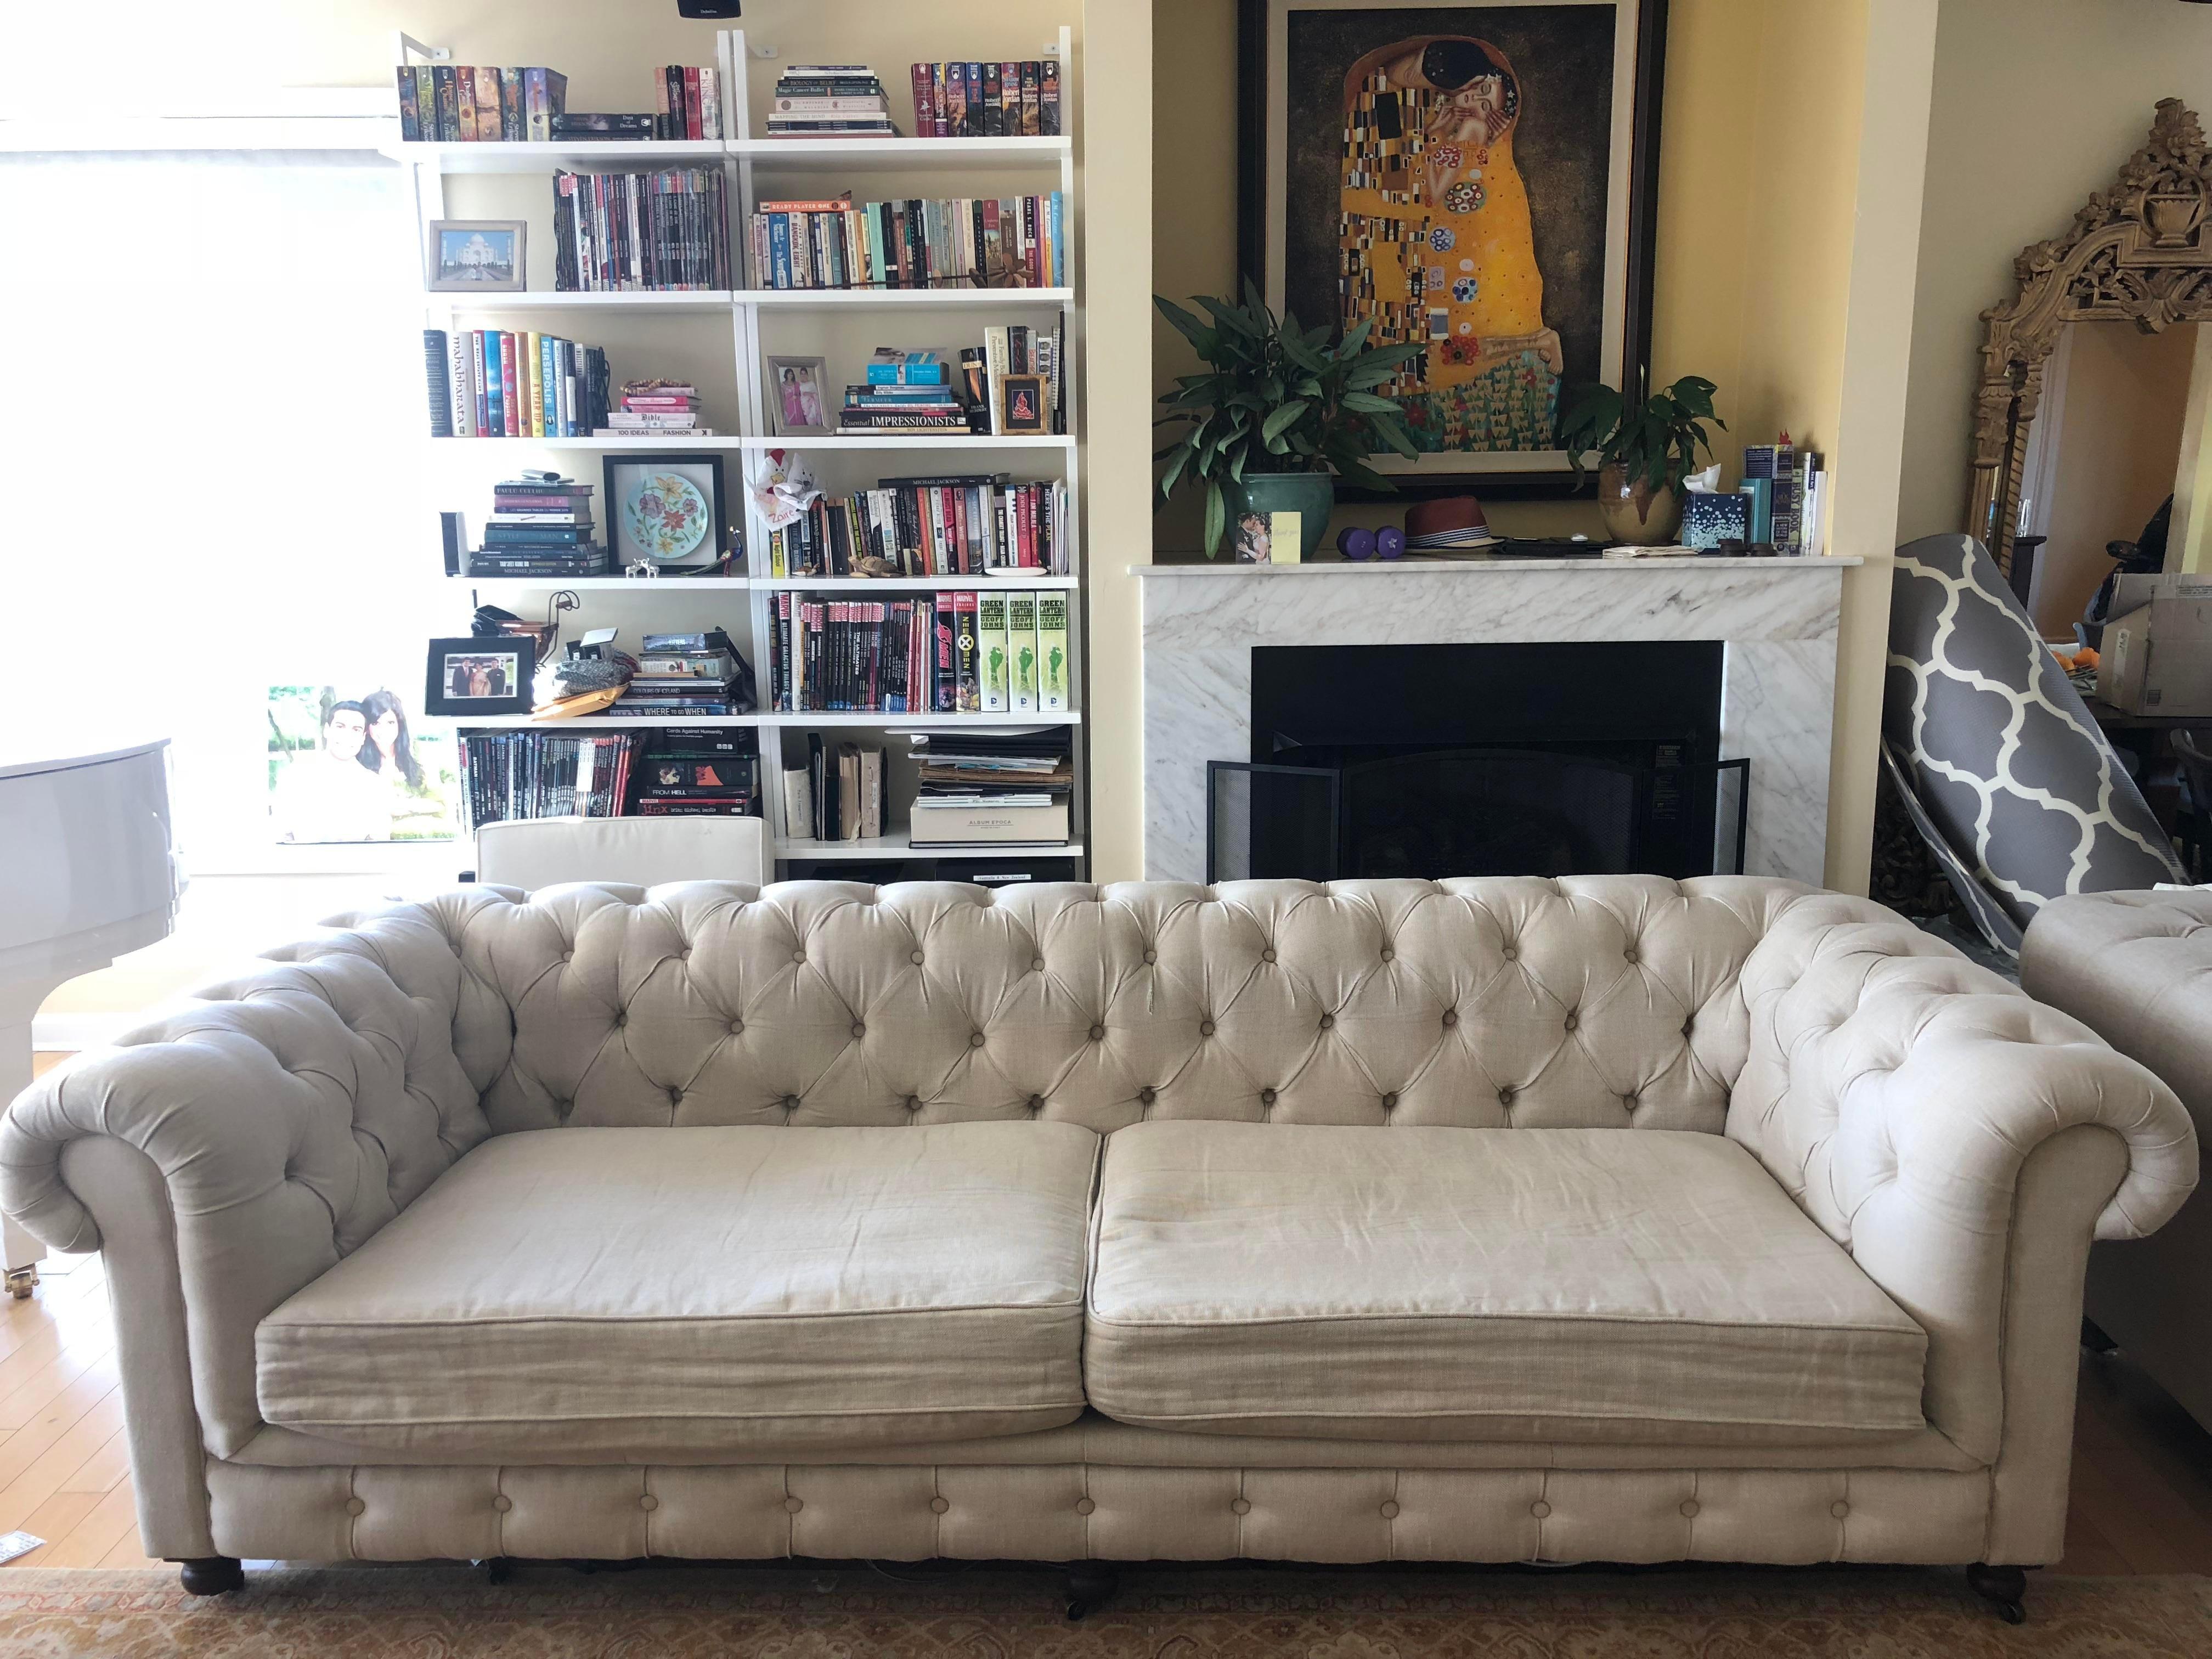 belgian linen sofa t cushion slipcovers canada restoration hardware 9 luxe kensington chairish for sale in new york image